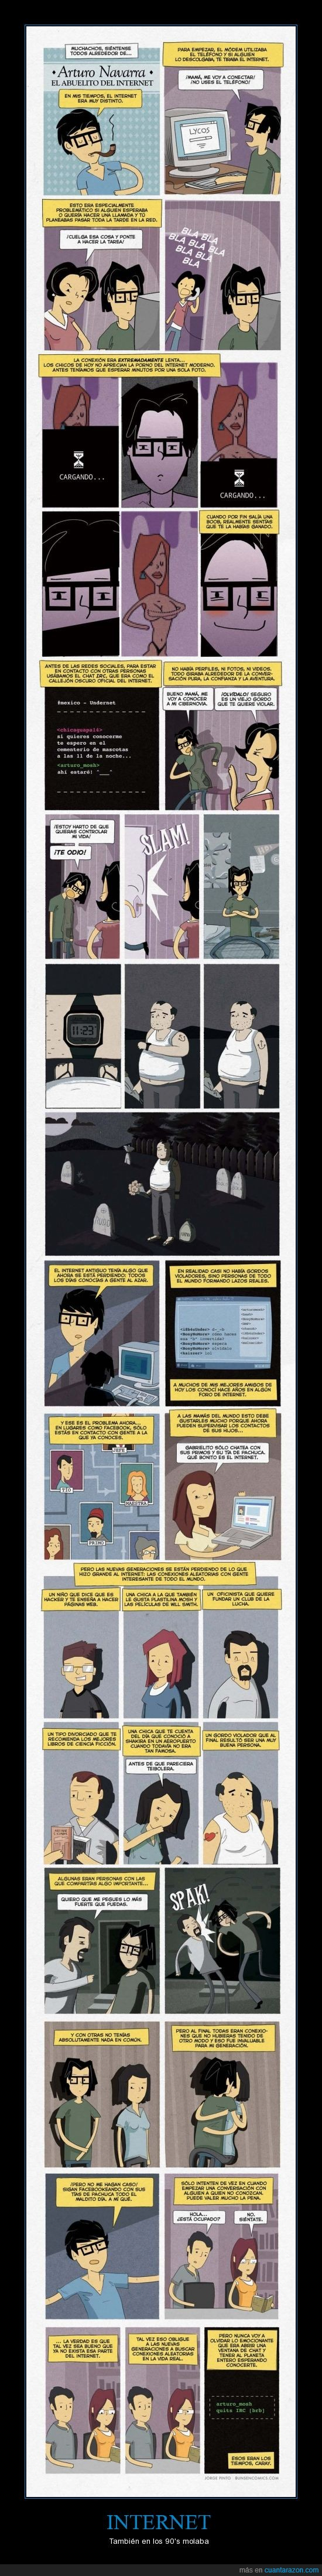 90s,años,antiguo,chat,desconocido,friki,Internet,IRC